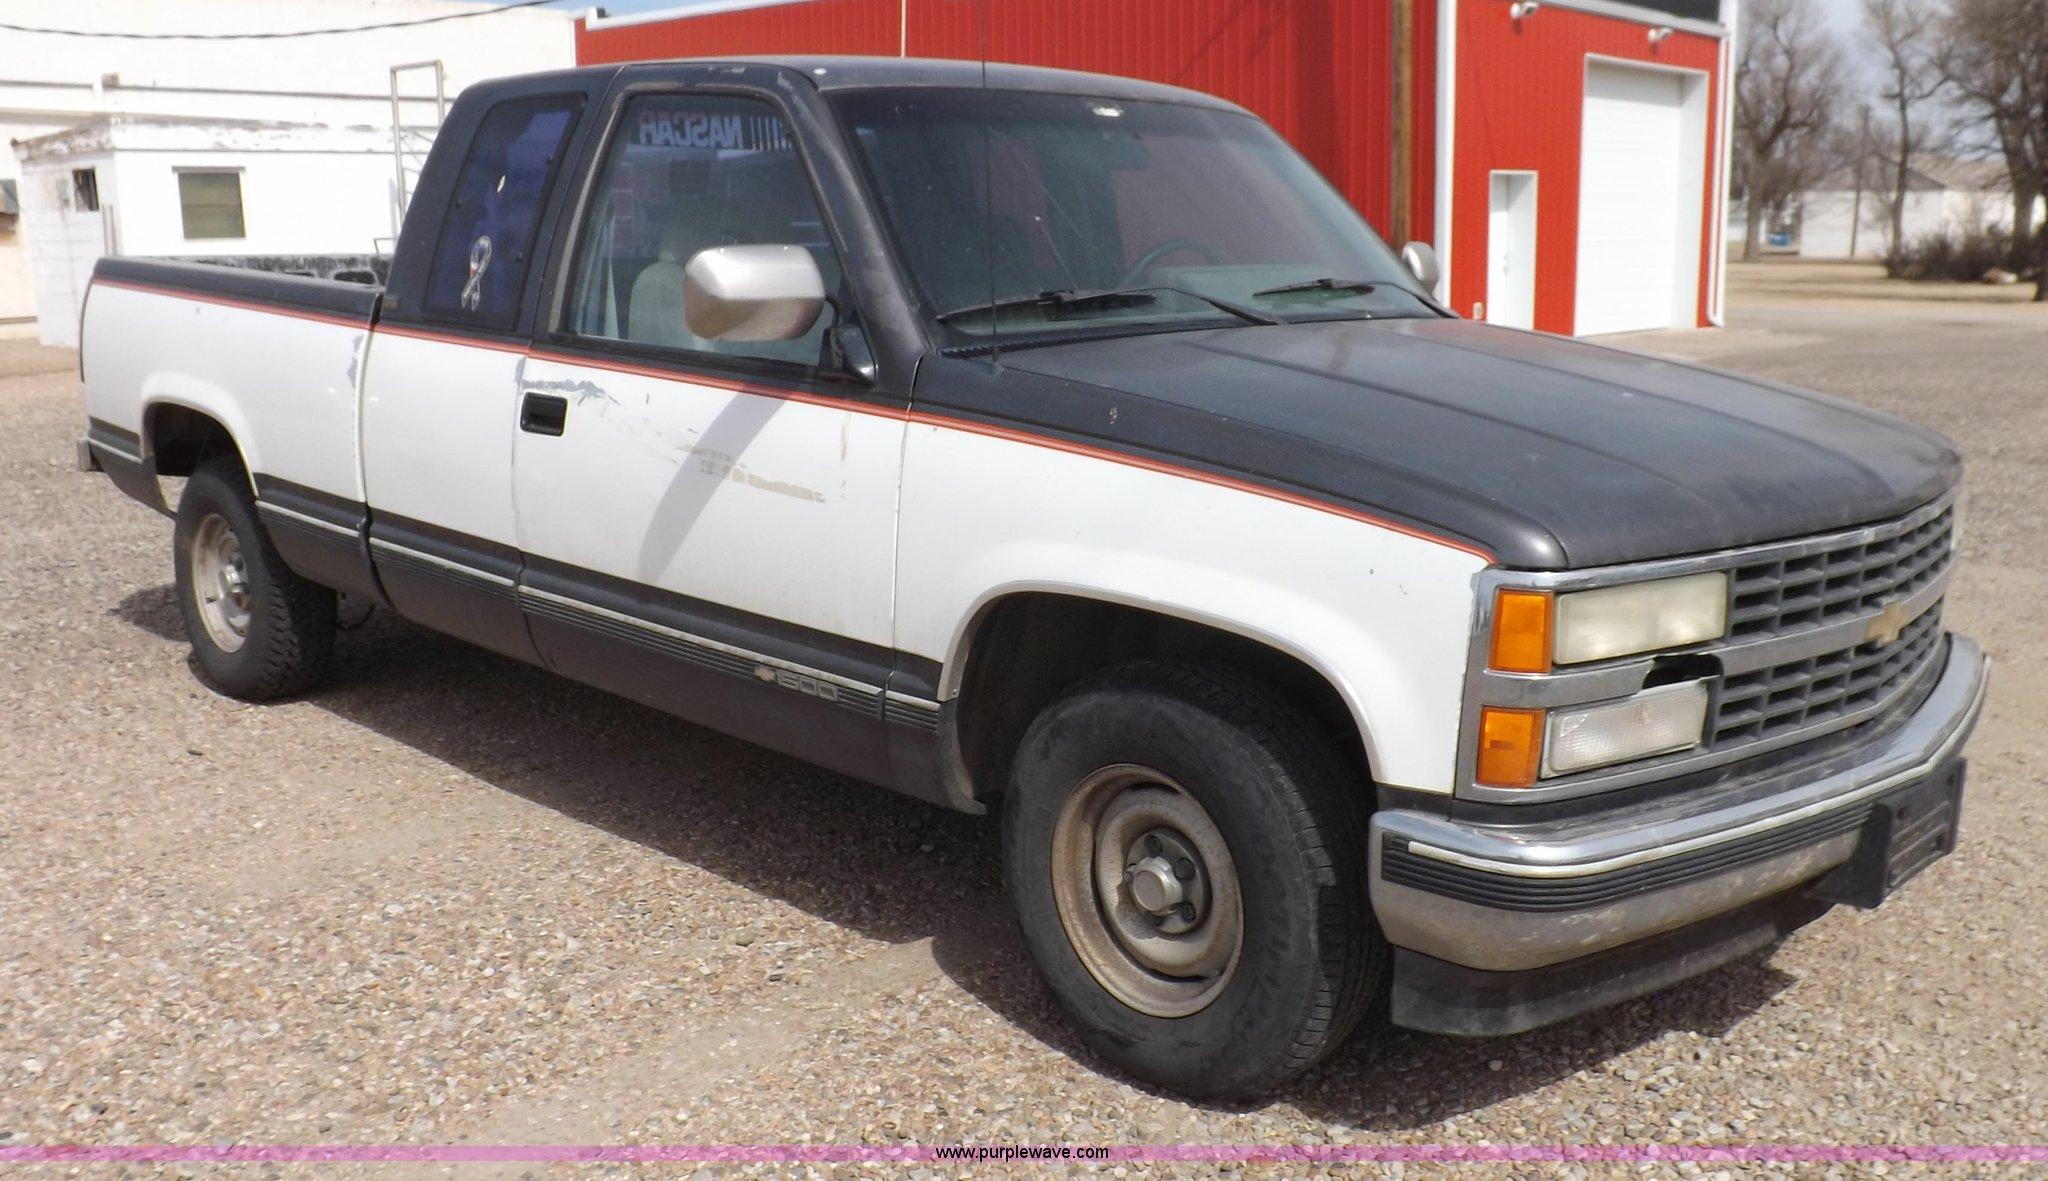 1992 chevrolet silverado 1500 ext. cab pickup truck | item k